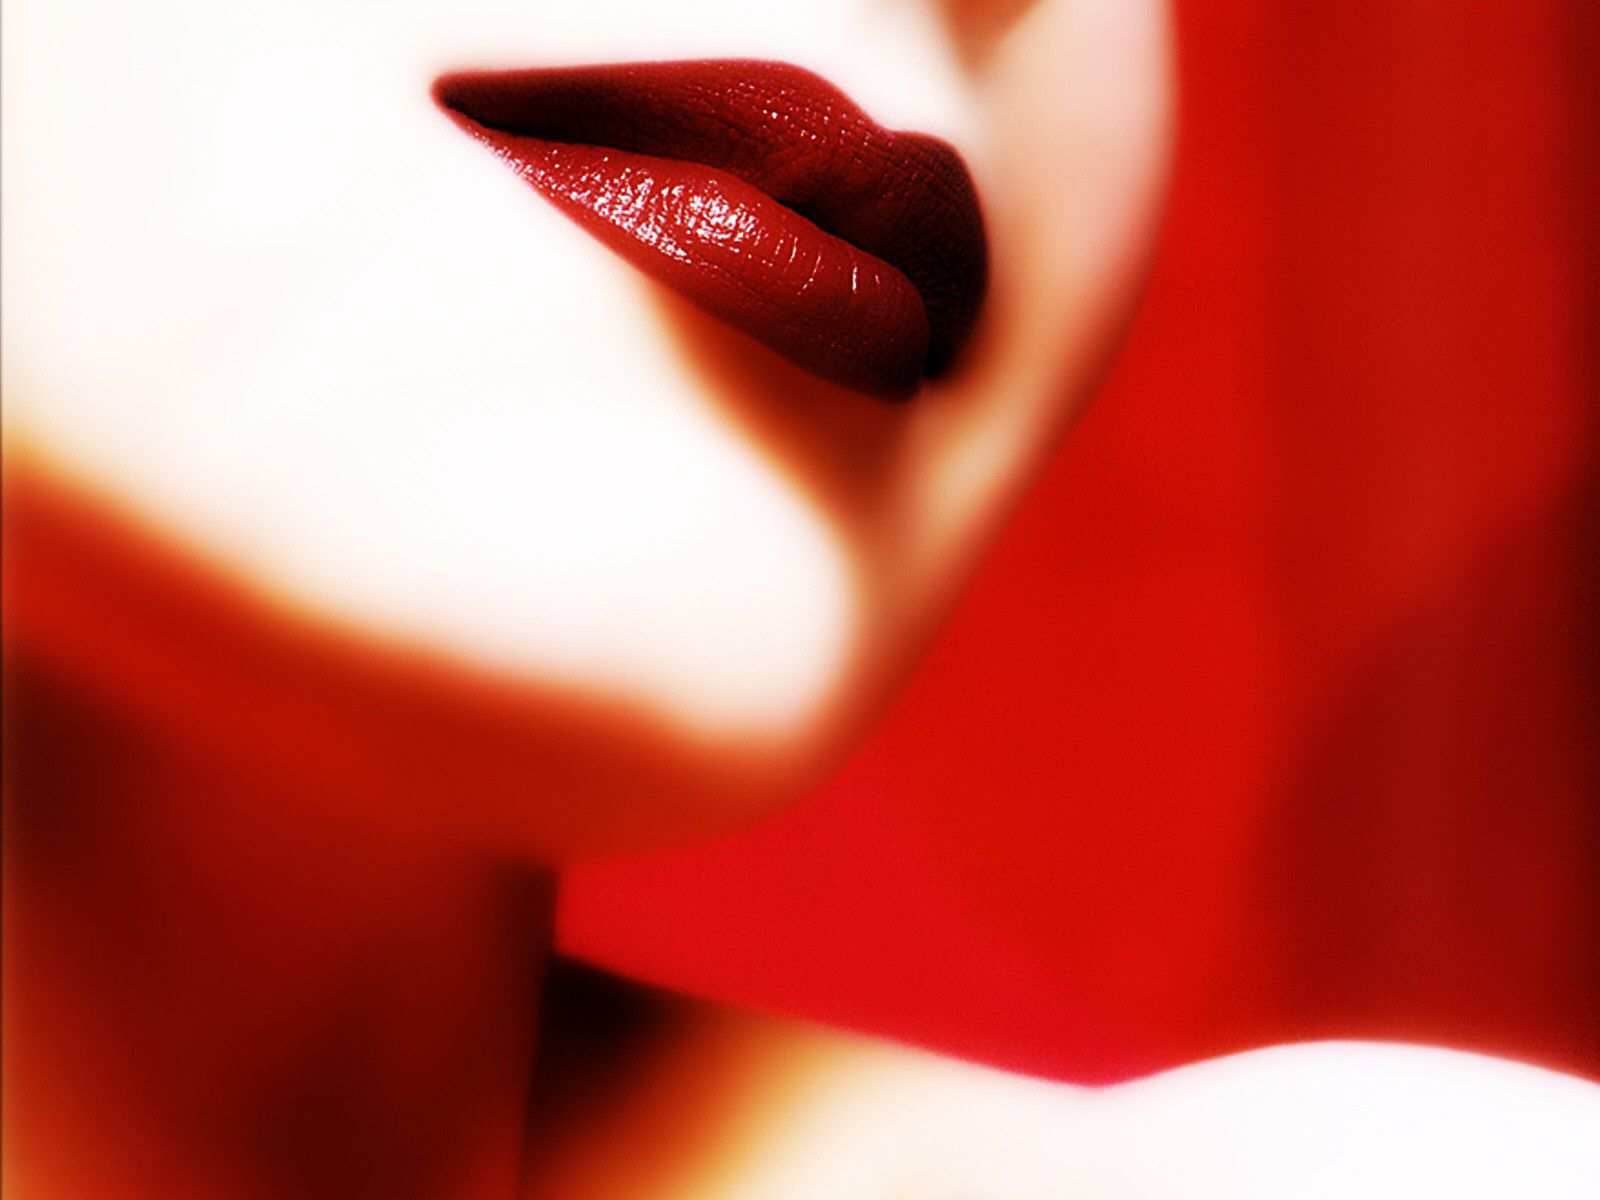 Reddish Lips Wallpapers HD Wallpapers 1600x1200